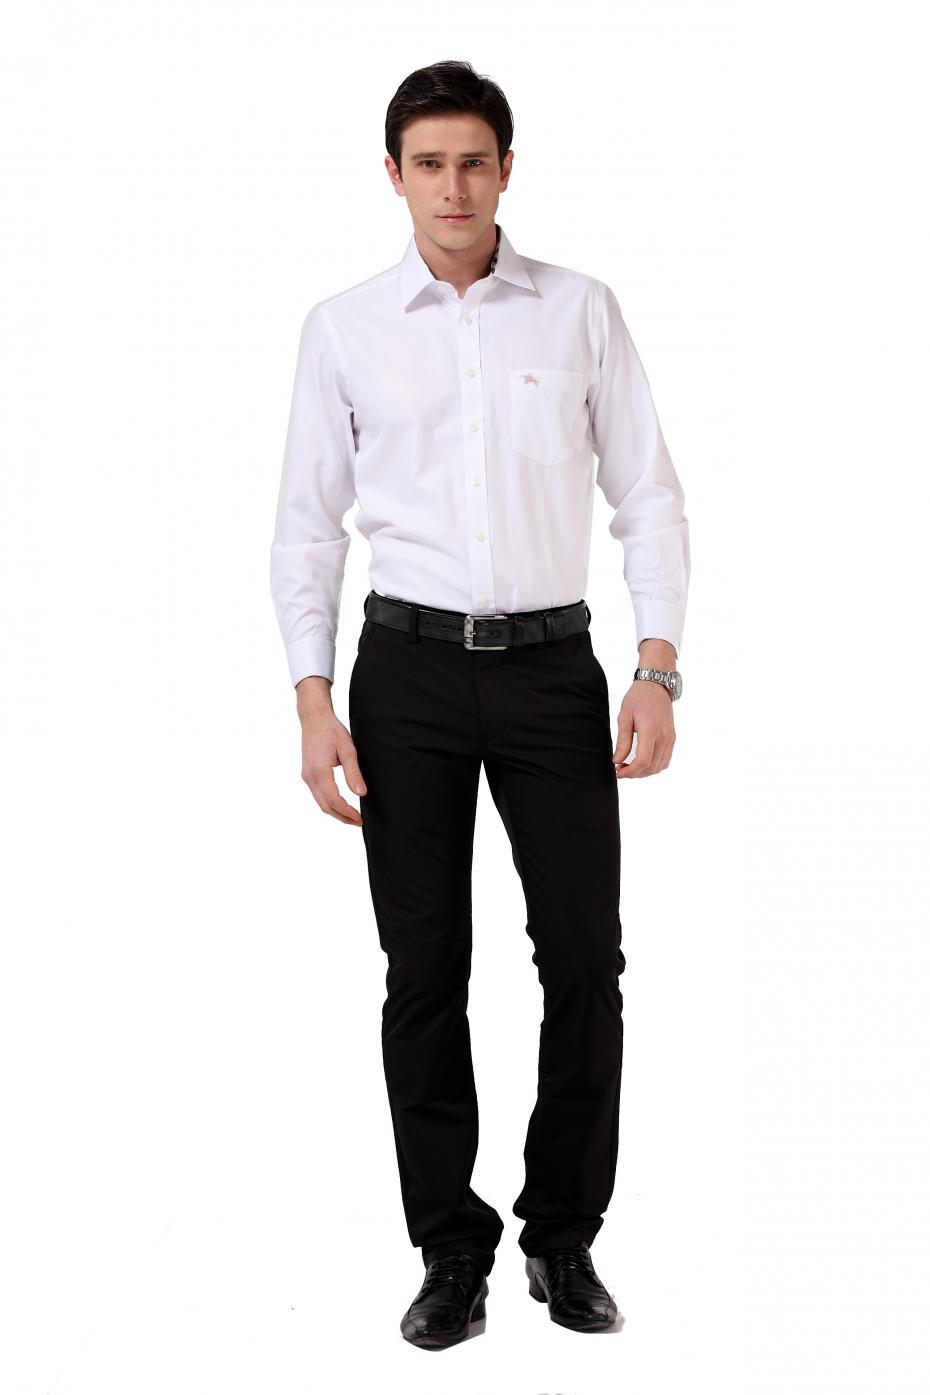 Classic casual business Mens shirts fashion 2015 long ... Classic Casual Fashion Men